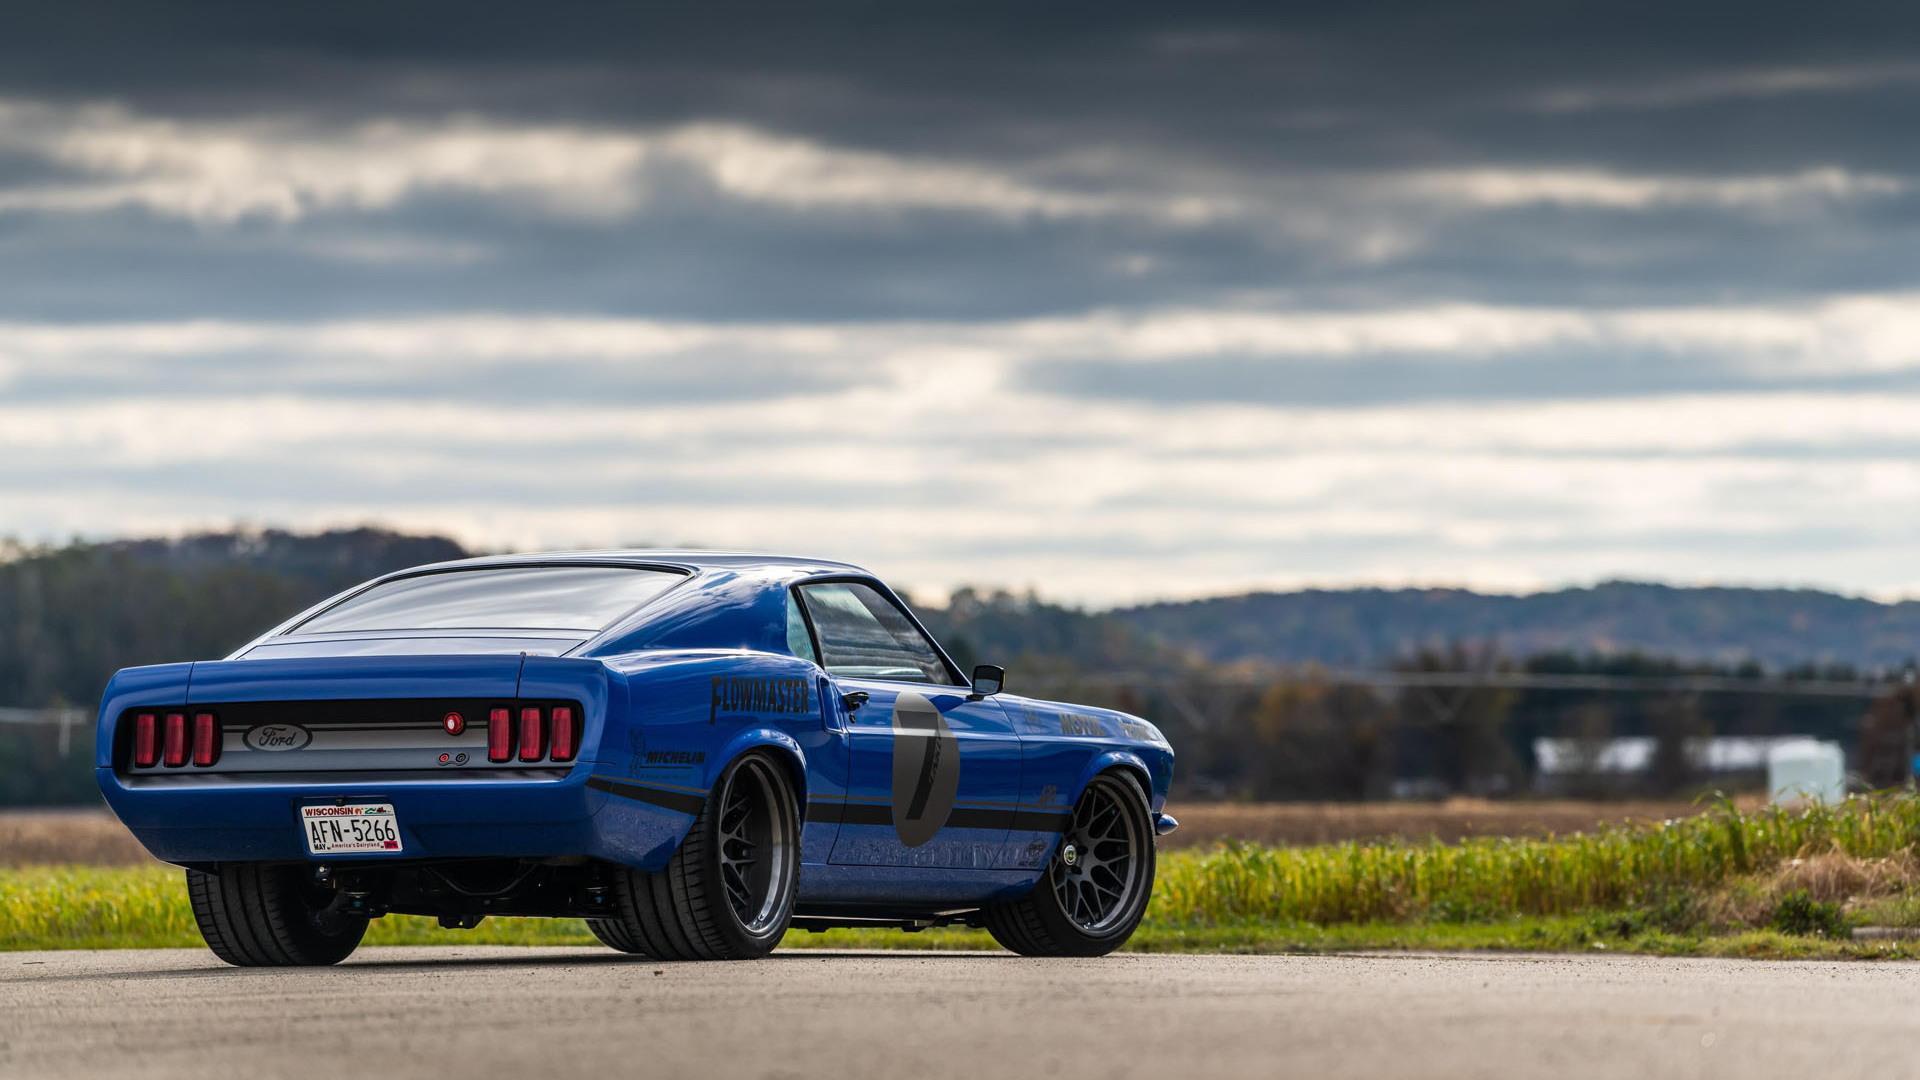 Ringbrothers Mustang Mach 1